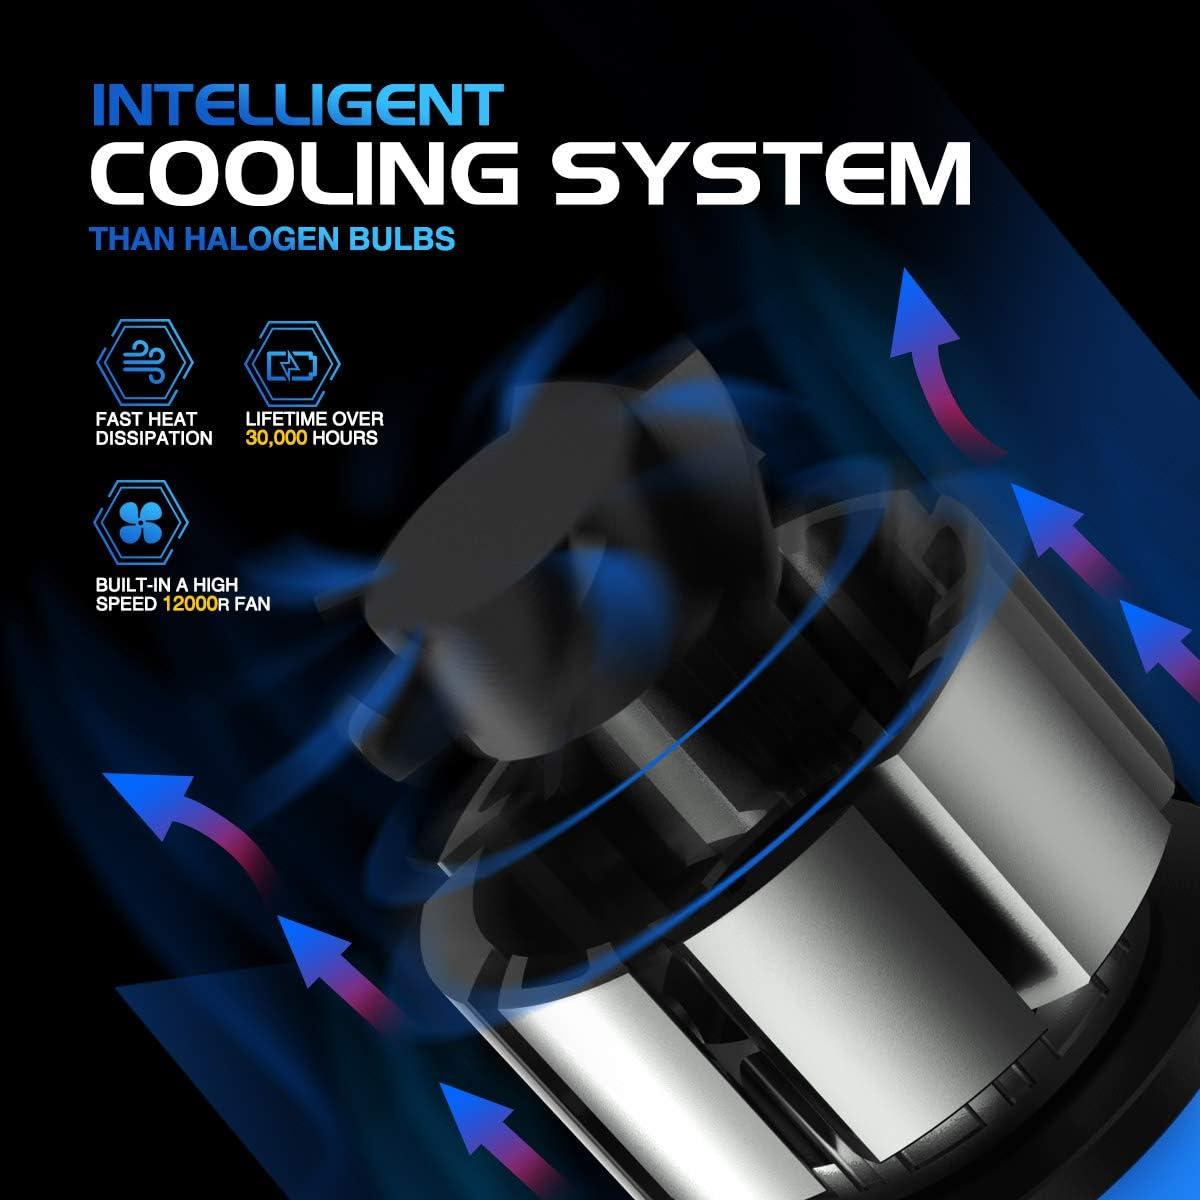 12 CSP Chips 6500K Xenon White Extremely Bright Light 12V. 2 Pcs//Kit ZonCar H11 // H8 // H9 // H16 Led Headlight Bulbs 2020